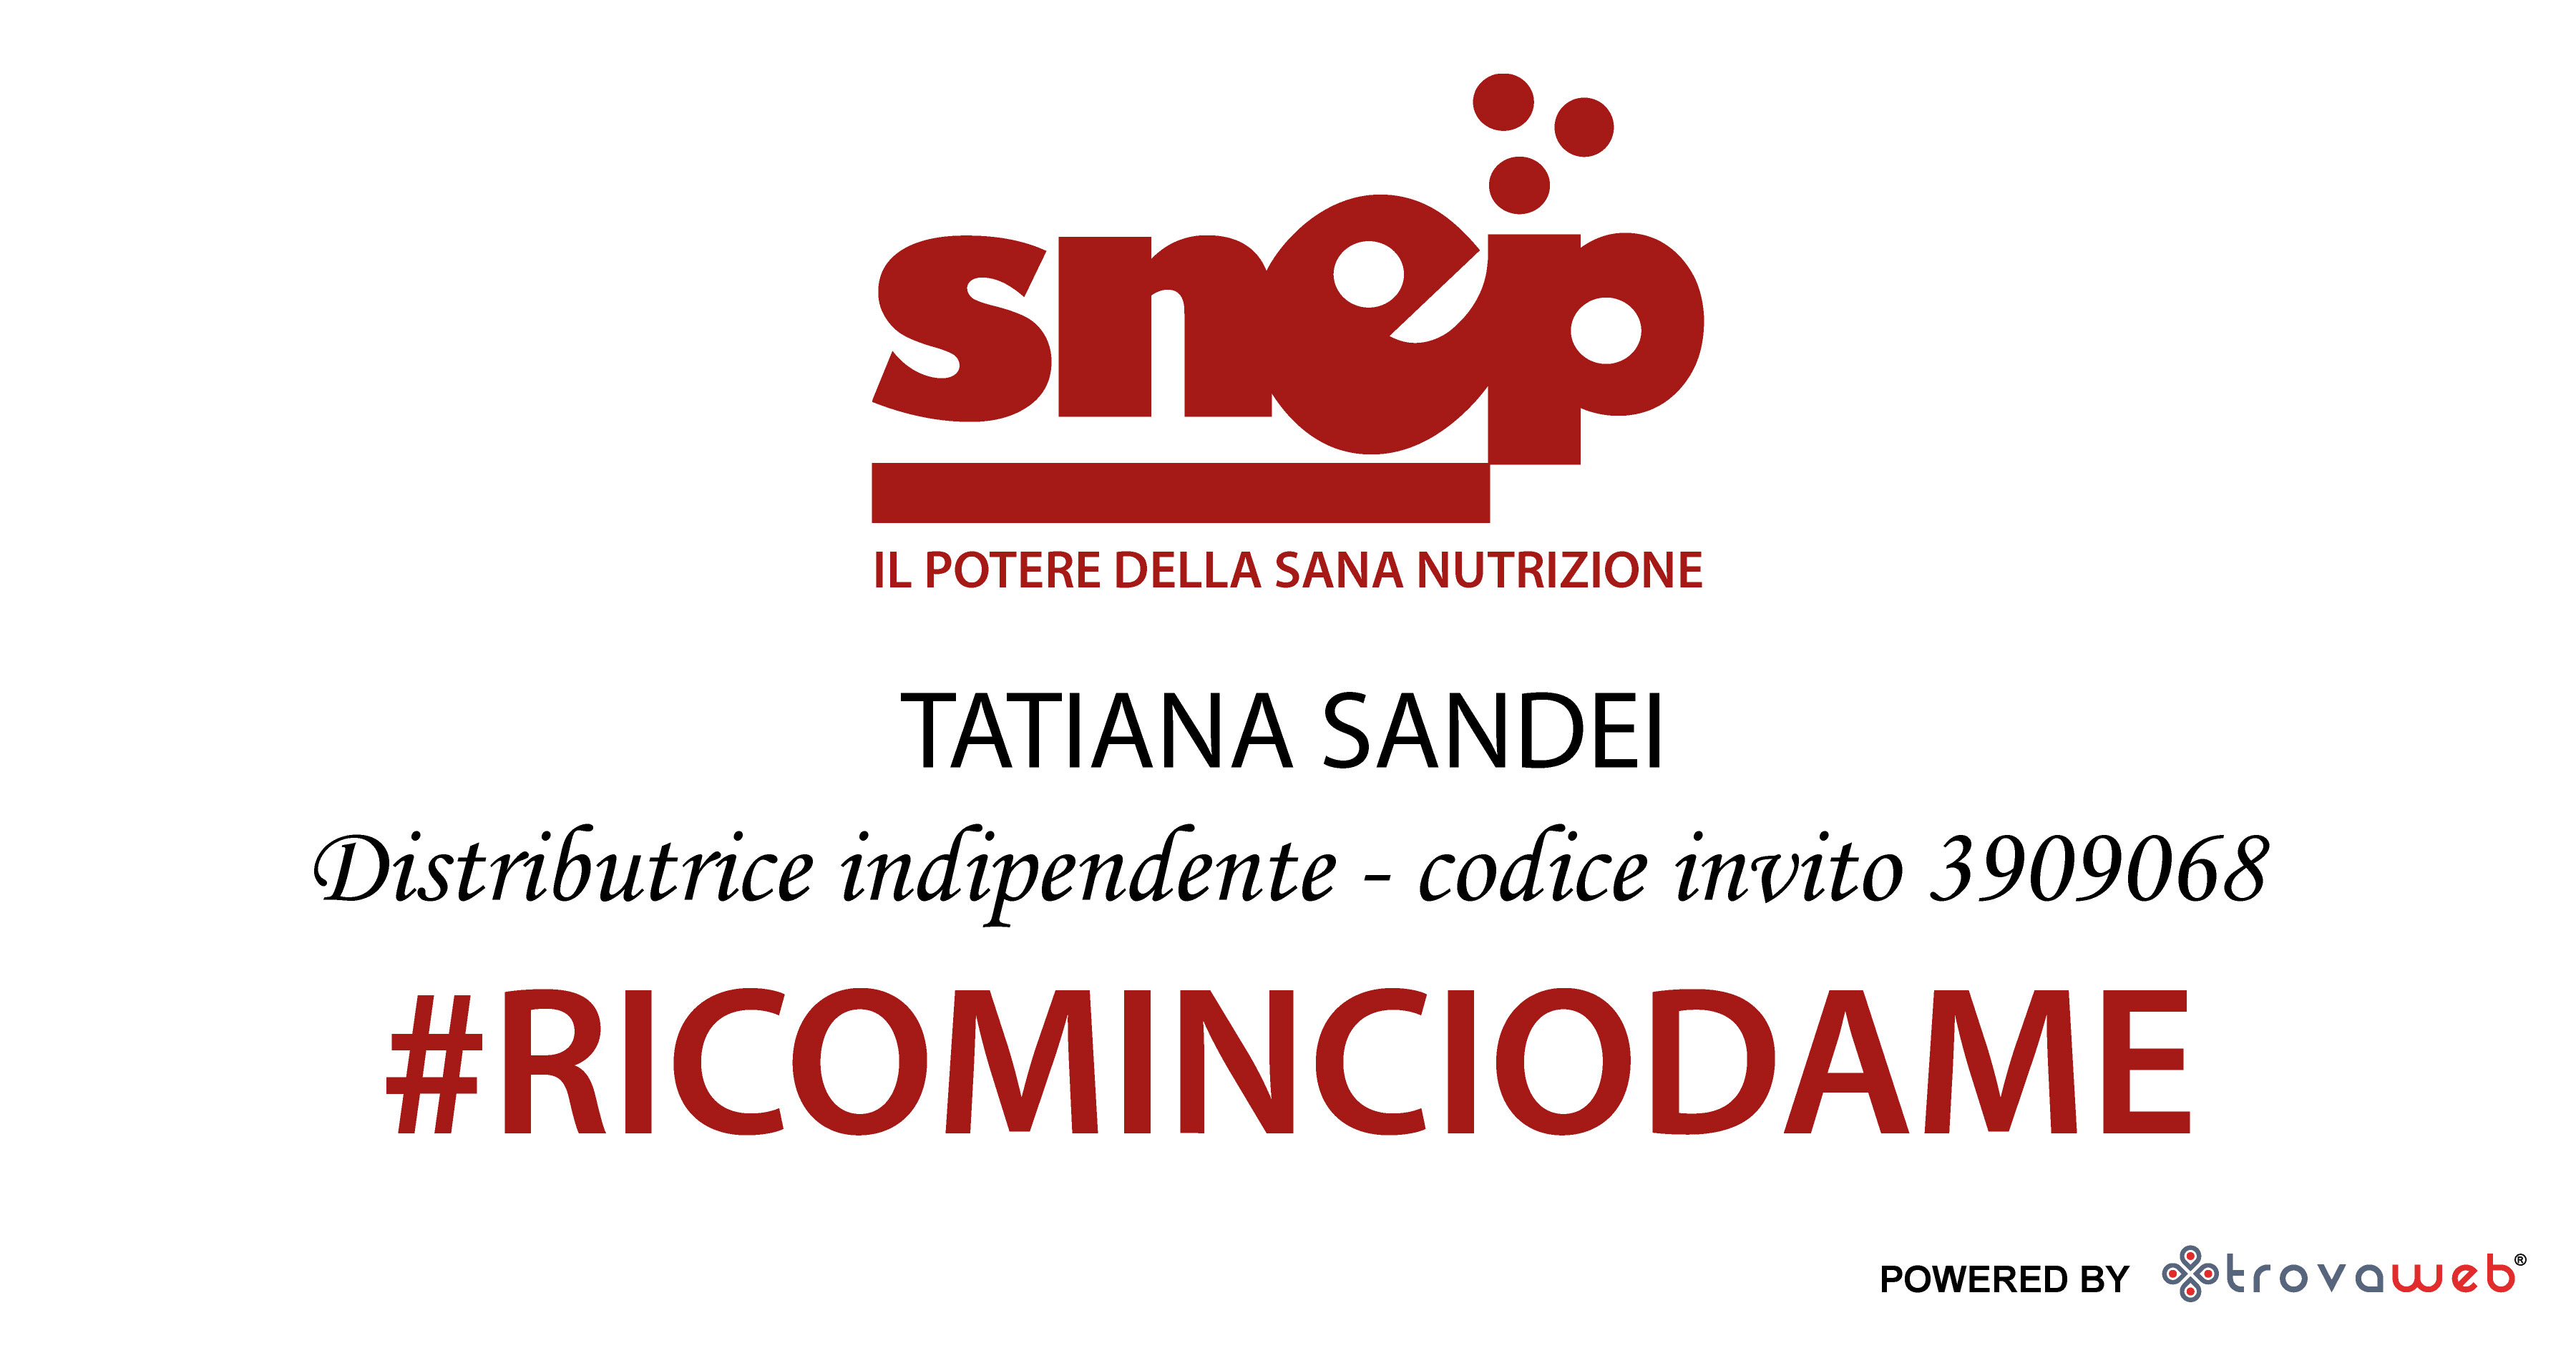 Food Educator Distributor Snep Tatiana Sandei